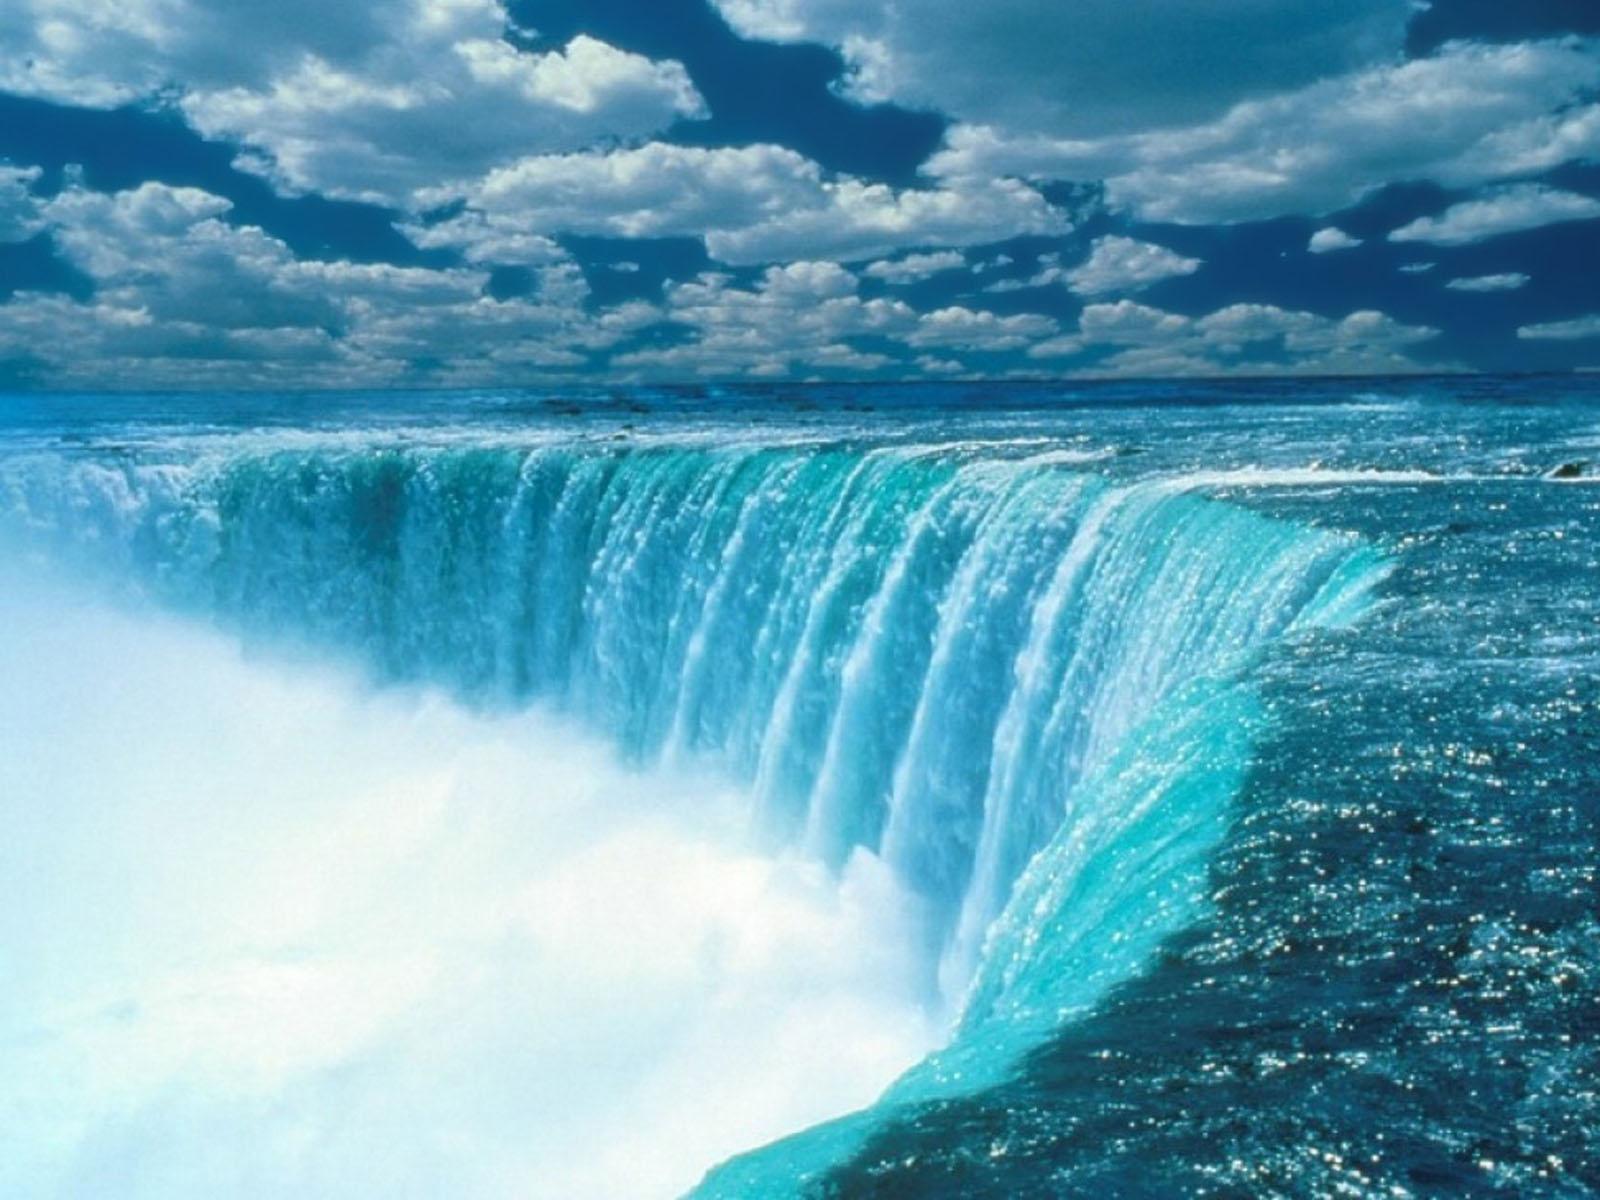 Niagara HD Wallpaper Nature Wallpapers 1600x1200